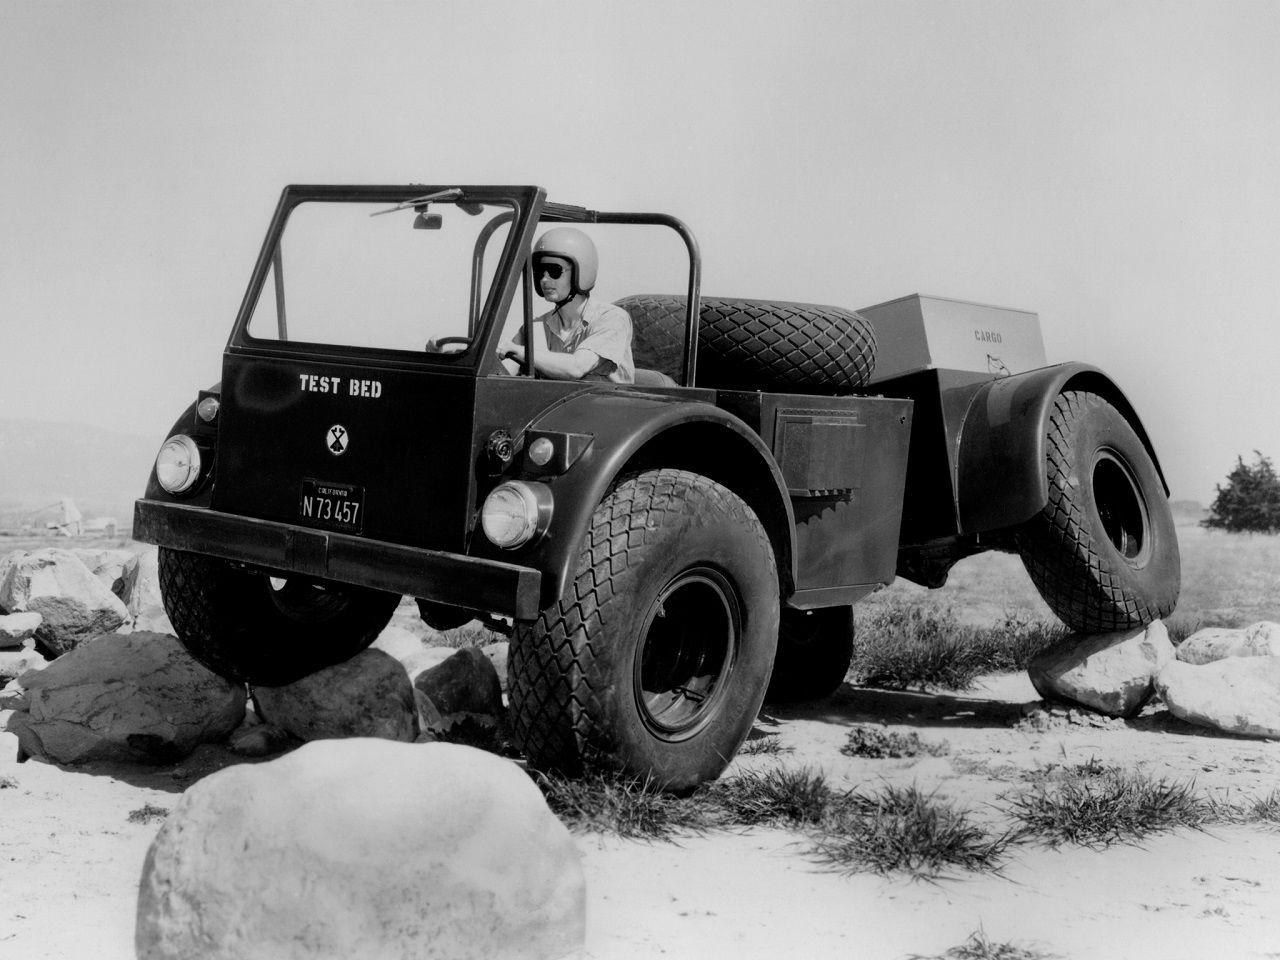 OG 1964 Chevrolet Sidewinder A crosscountry